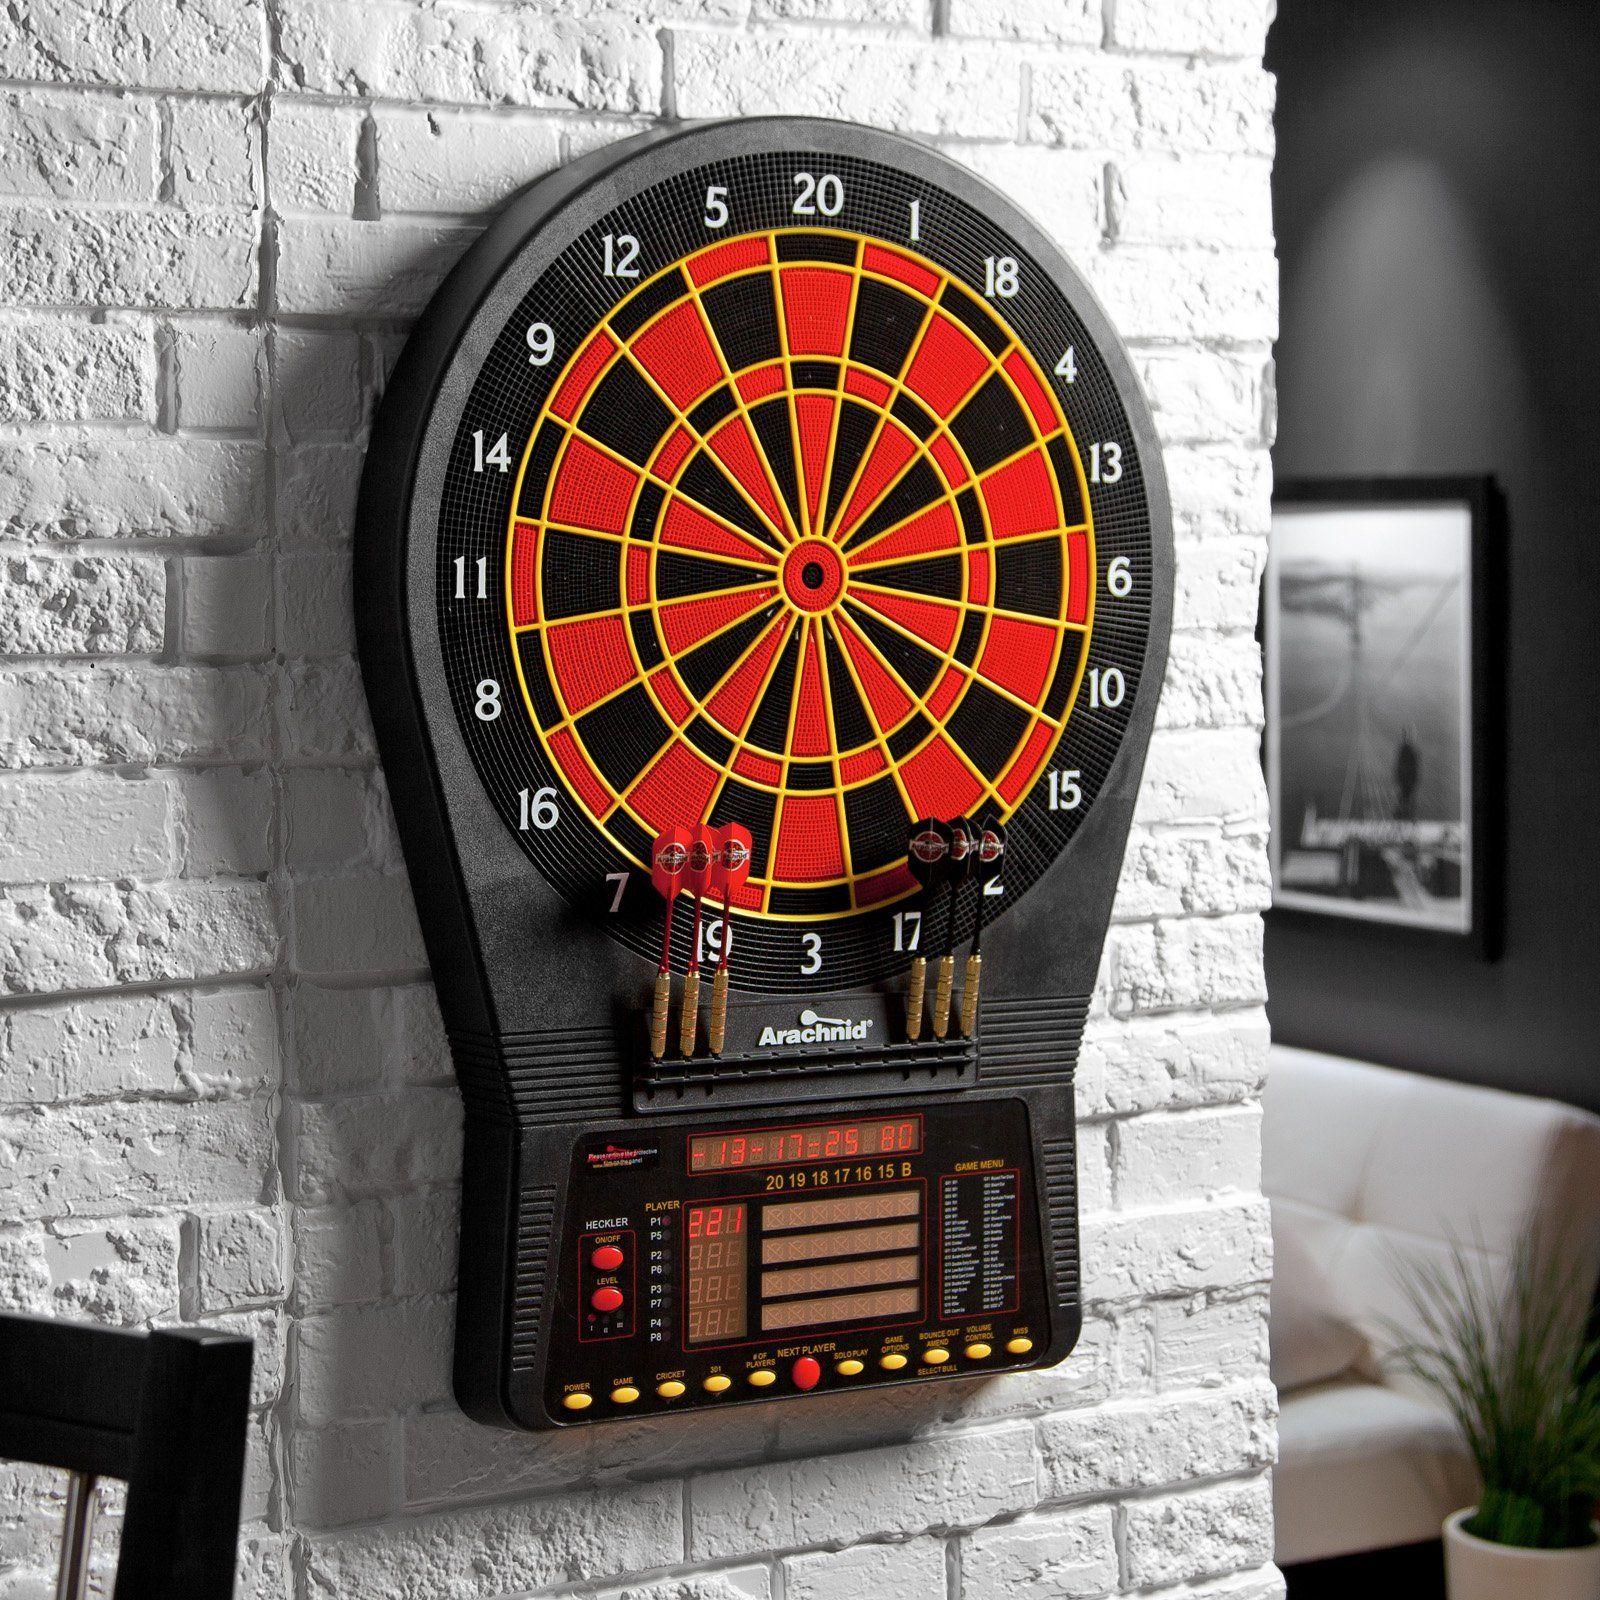 Arachnid Cricket Pro 800 Electronic Dart Board Awesome